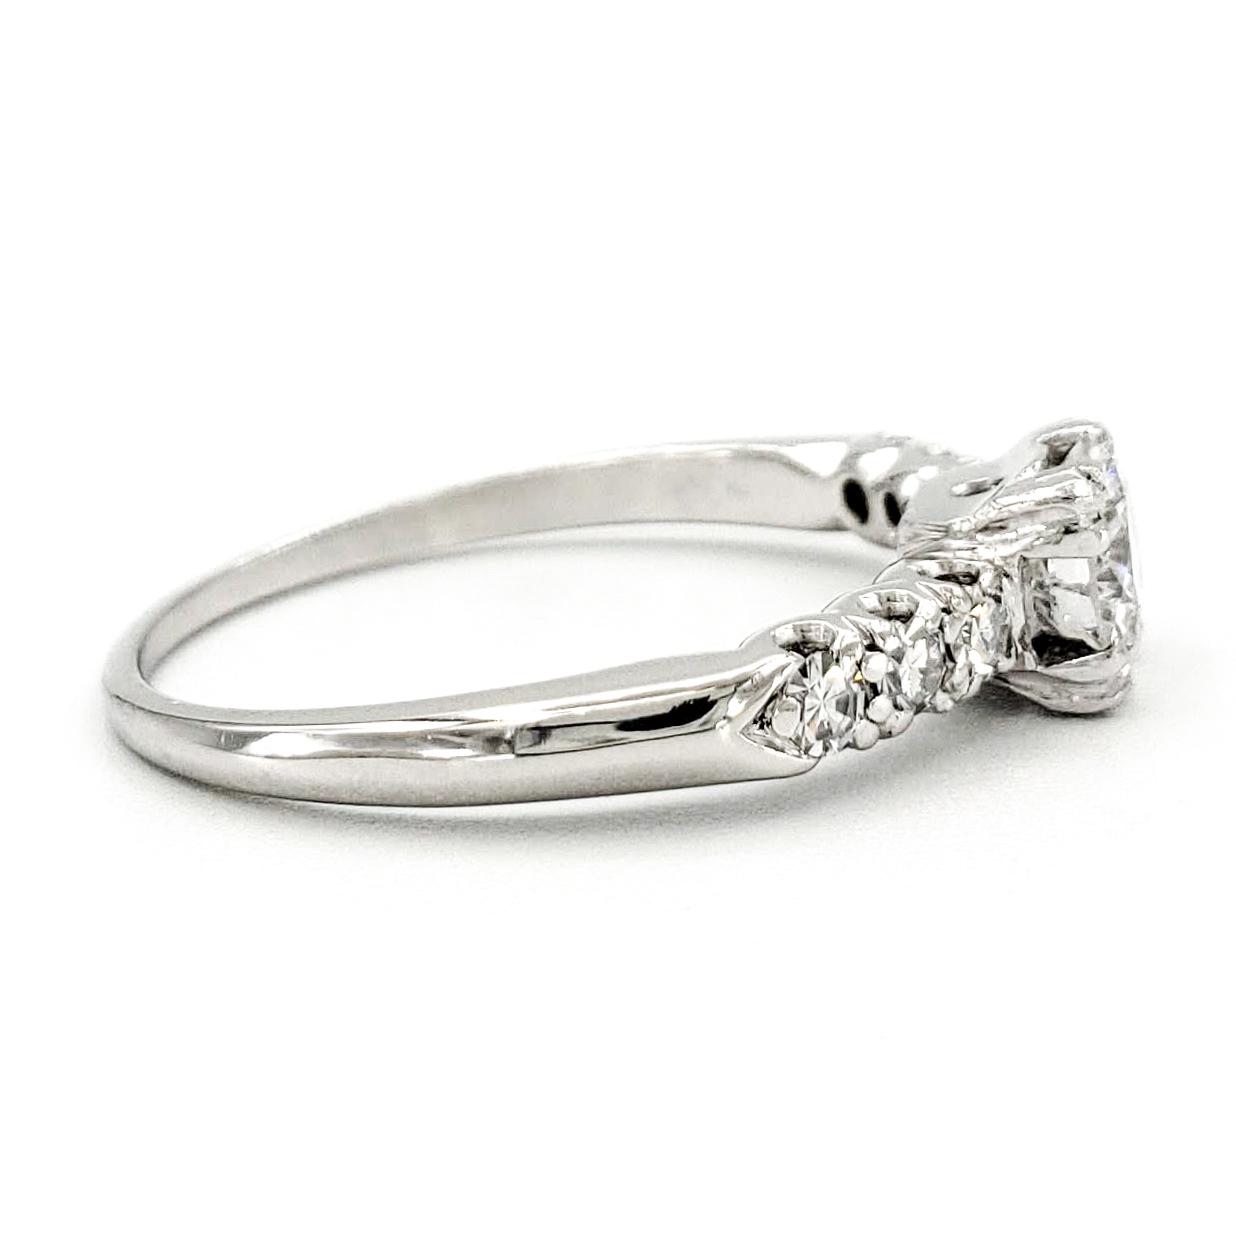 vintage-platinum-engagement-ring-with-0-52-carat-round-brilliant-cut-diamond-egl-e-si1